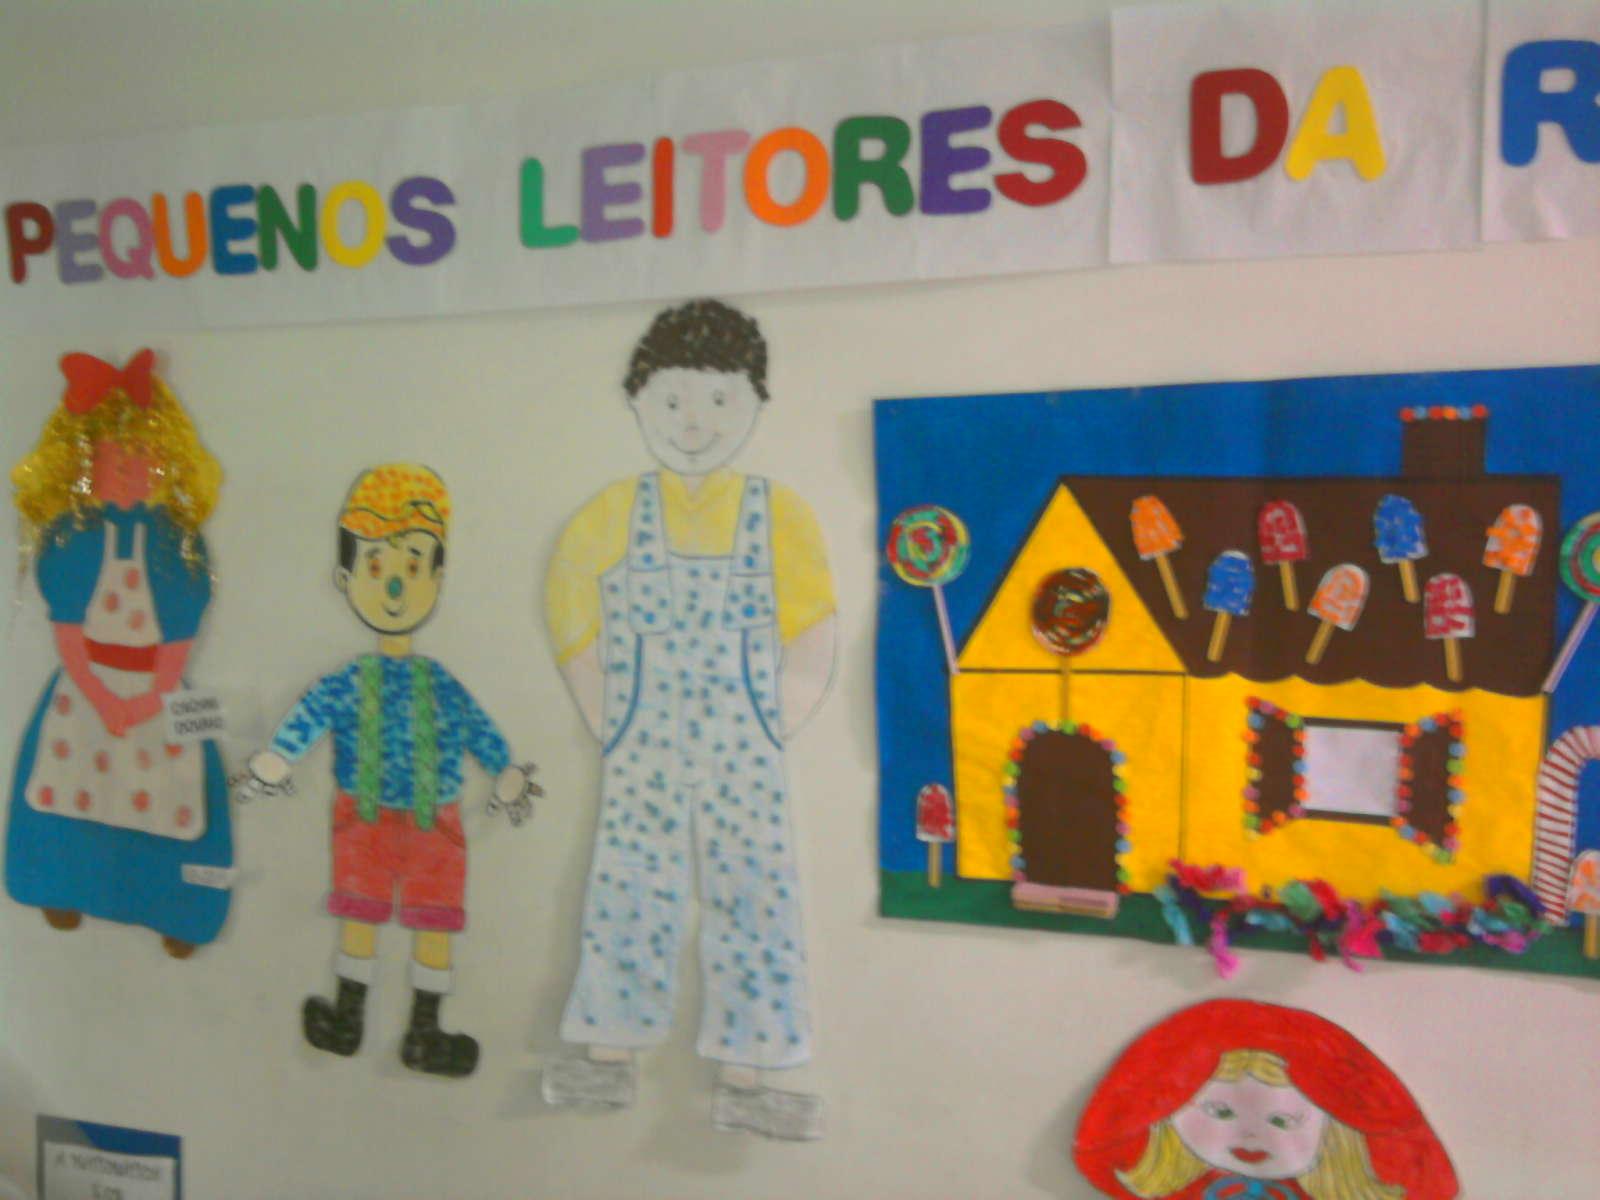 #BF810C  projeto exposto na 3ª Jornada Pedagógica da Educação Infantil 1600x1200 px Projeto Cozinha Na Educação Infantil_4295 Imagens